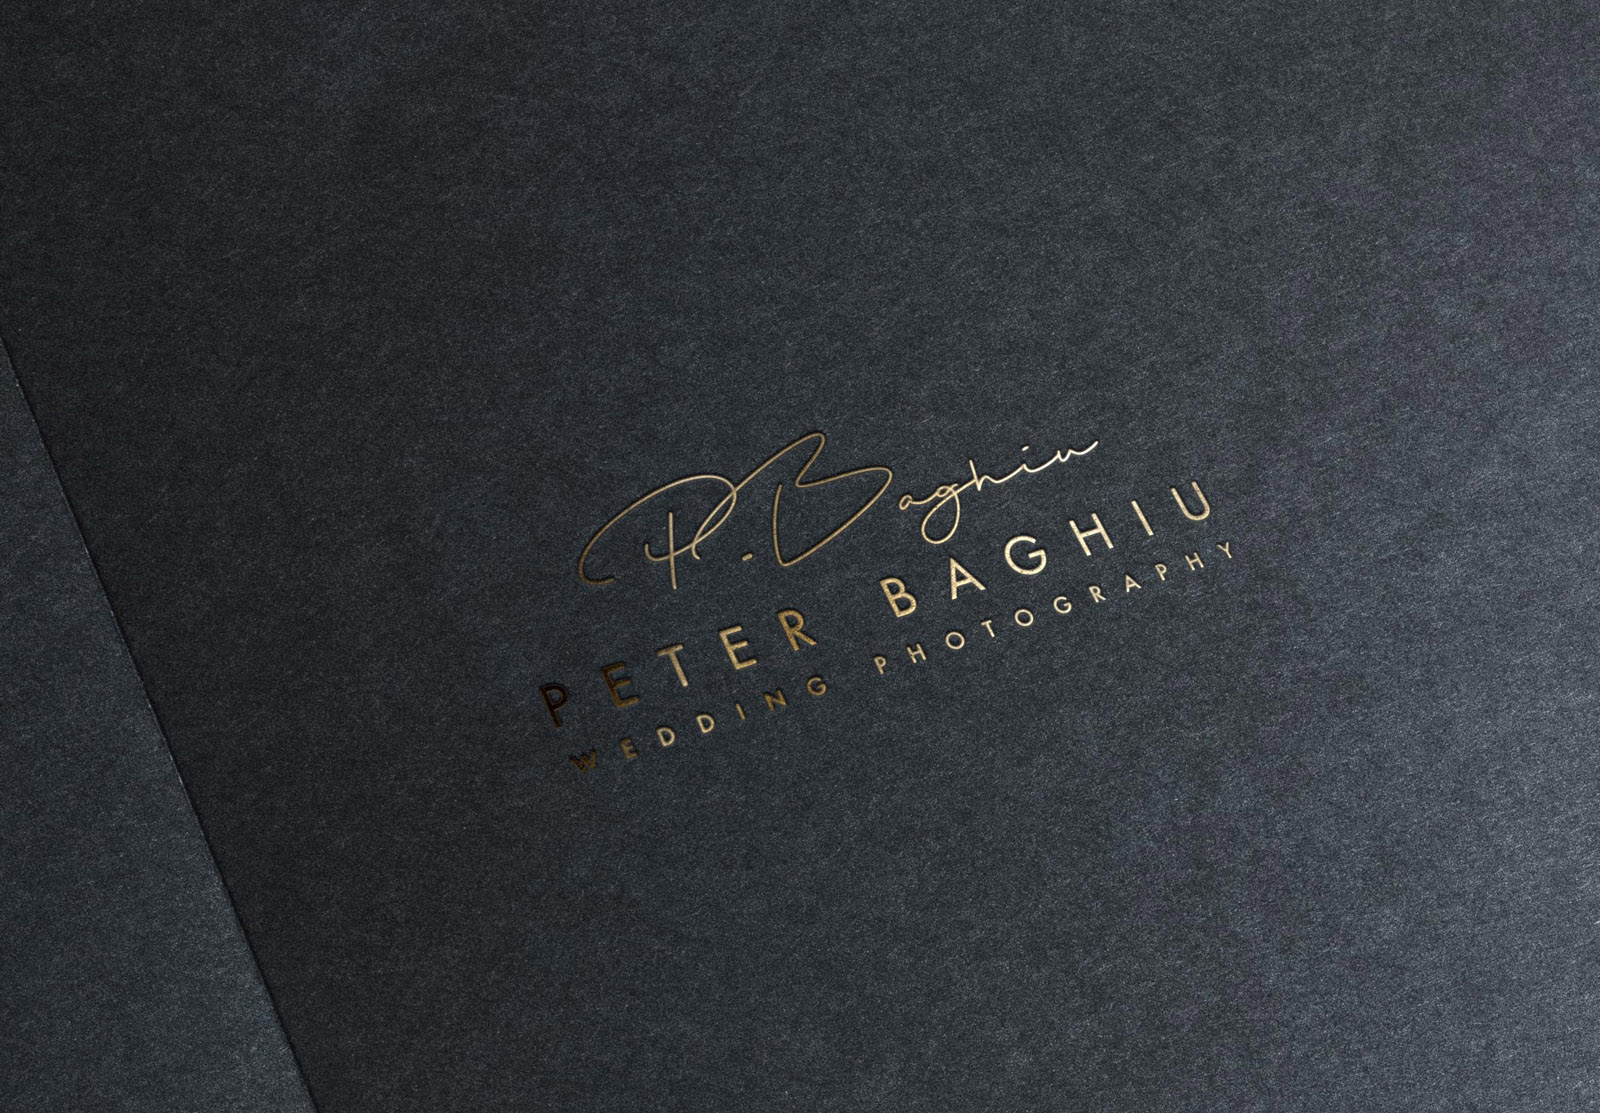 wedding-photographer-logo-design-07